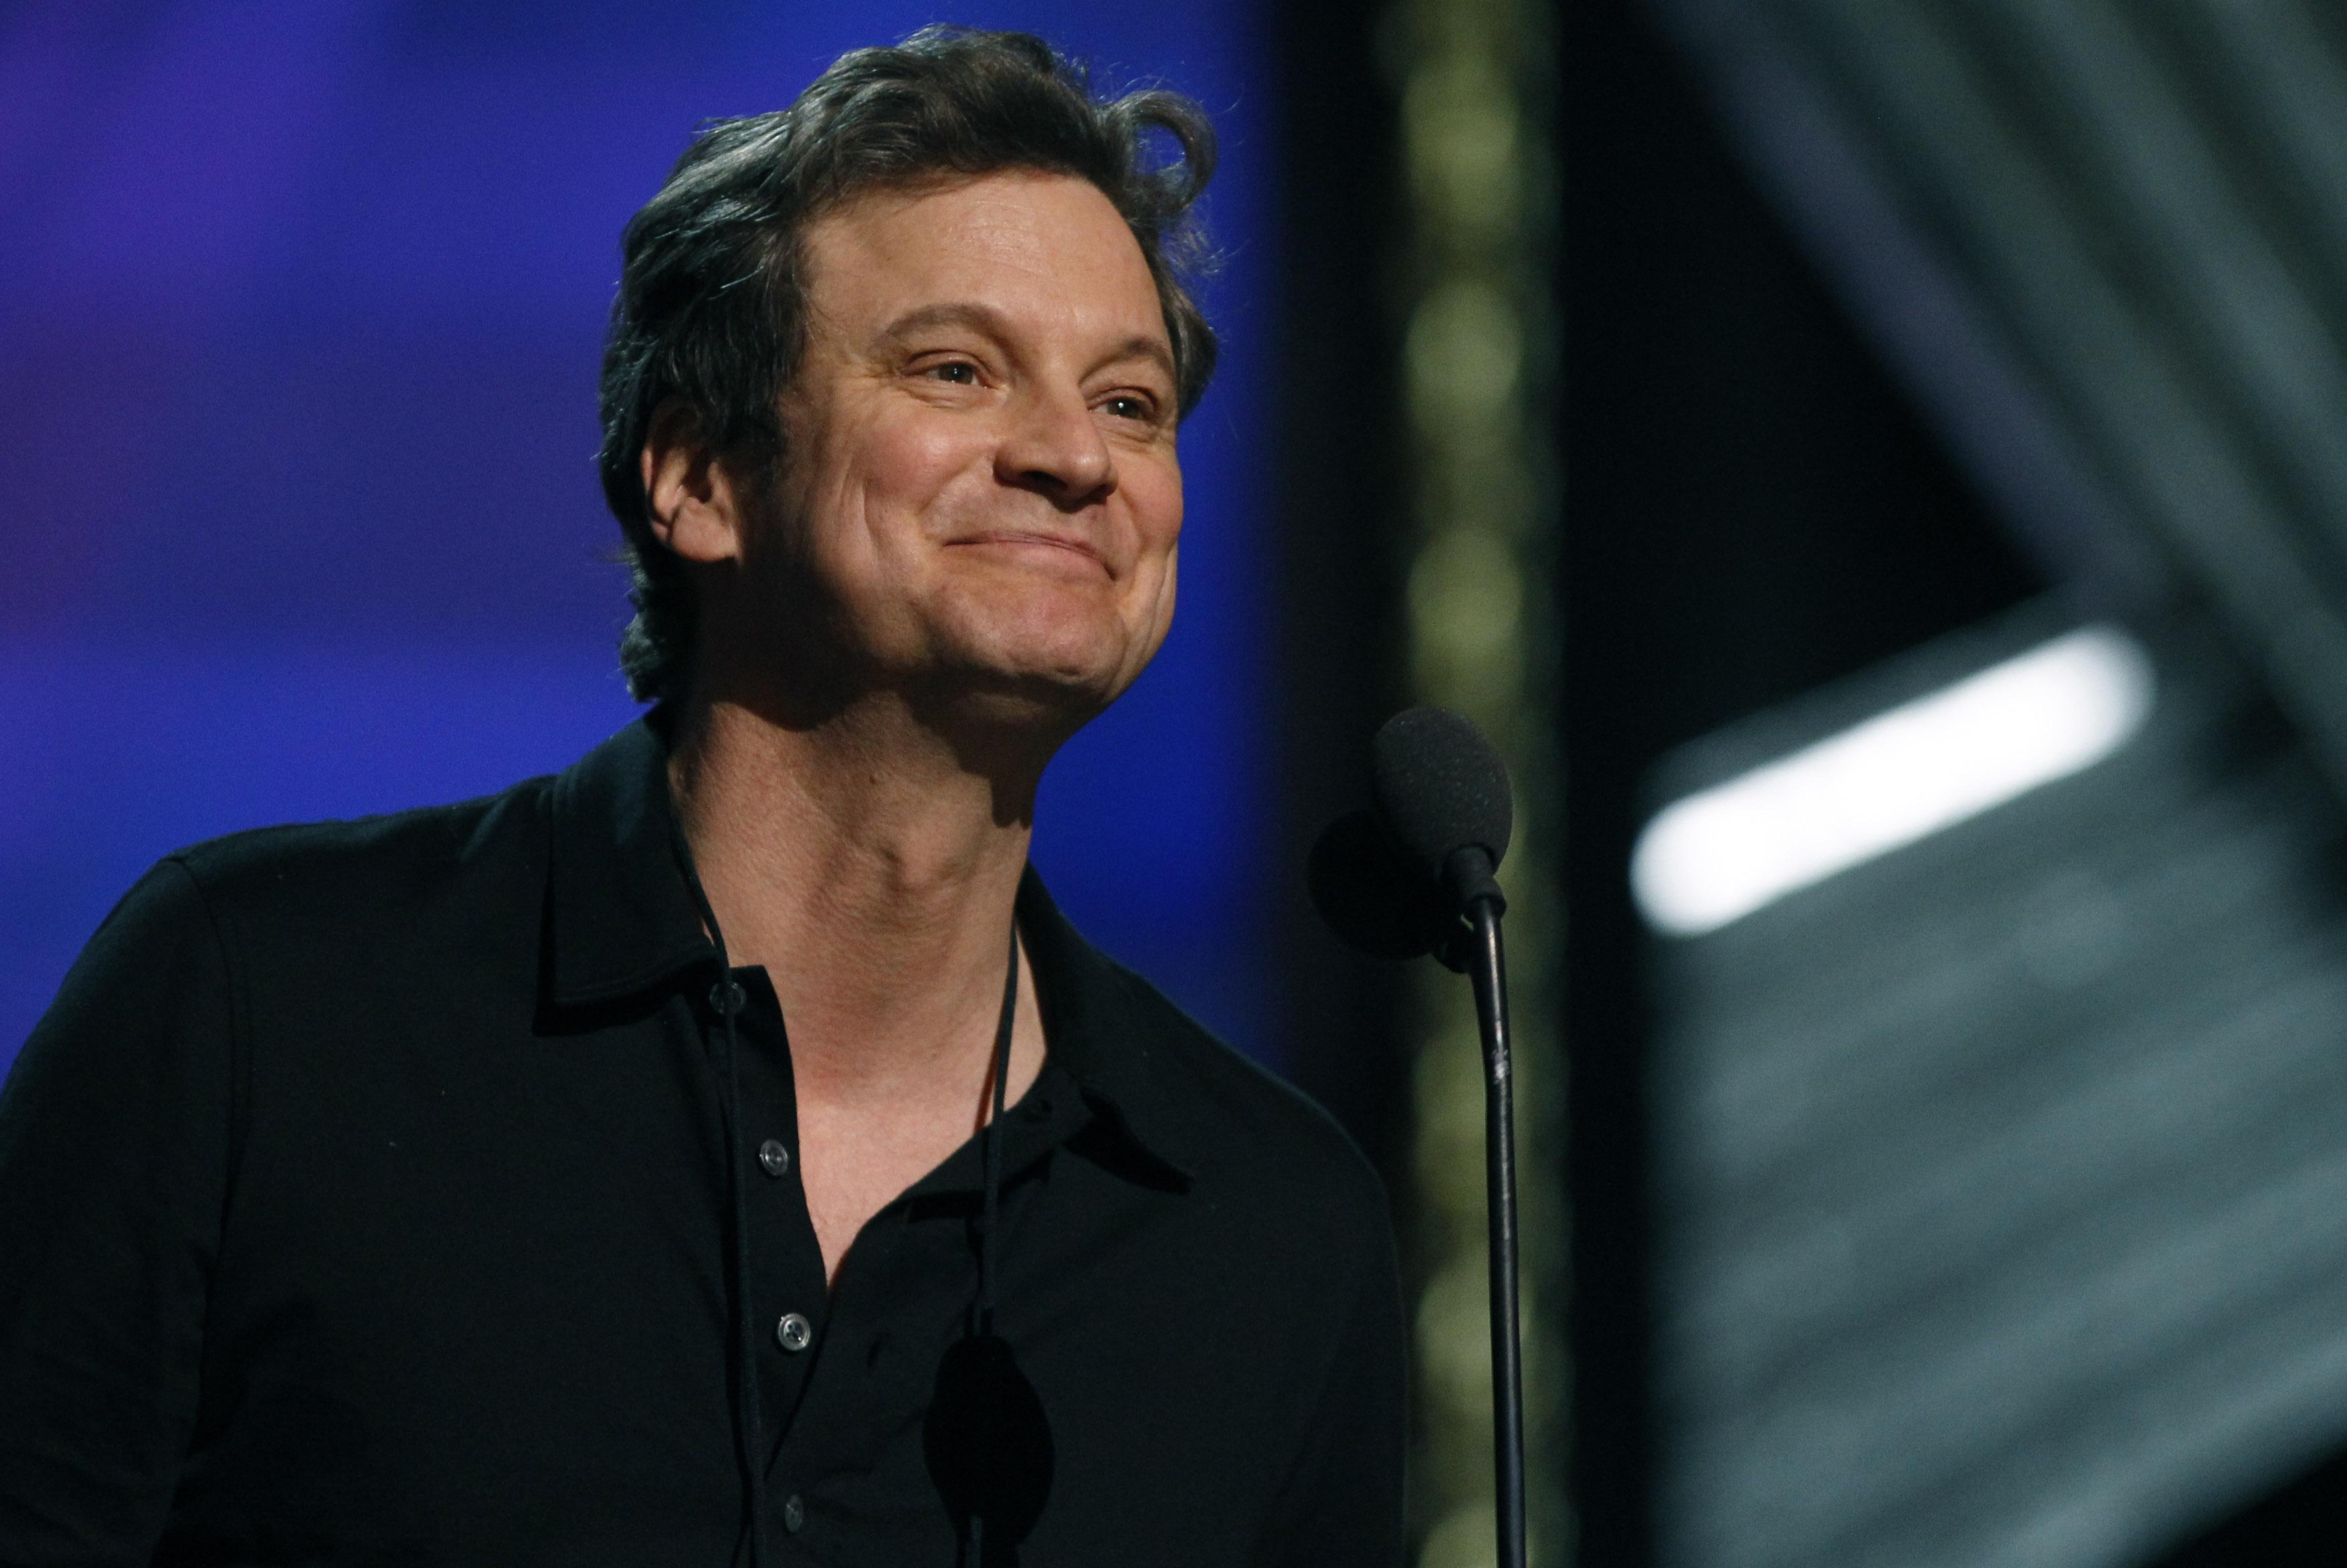 Colin Firth photo gall...